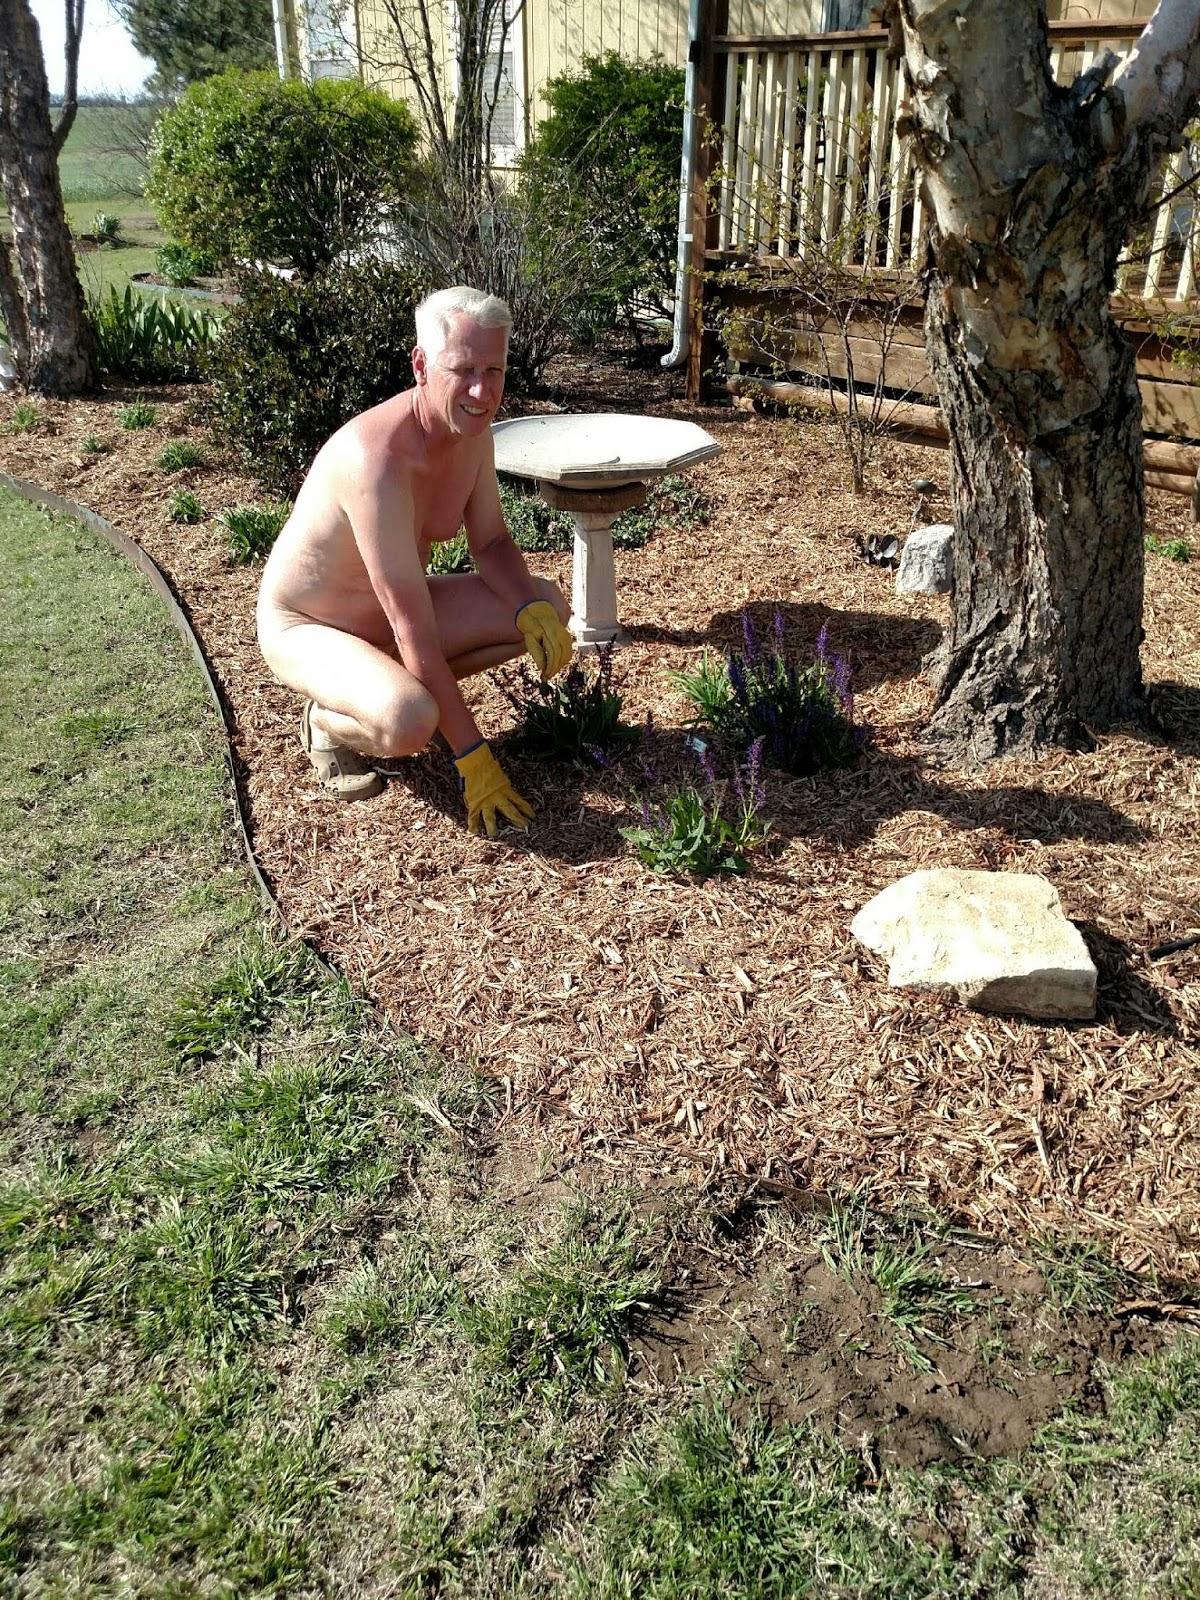 GNI BuffBuzz: World Naked Gardening Day 2018